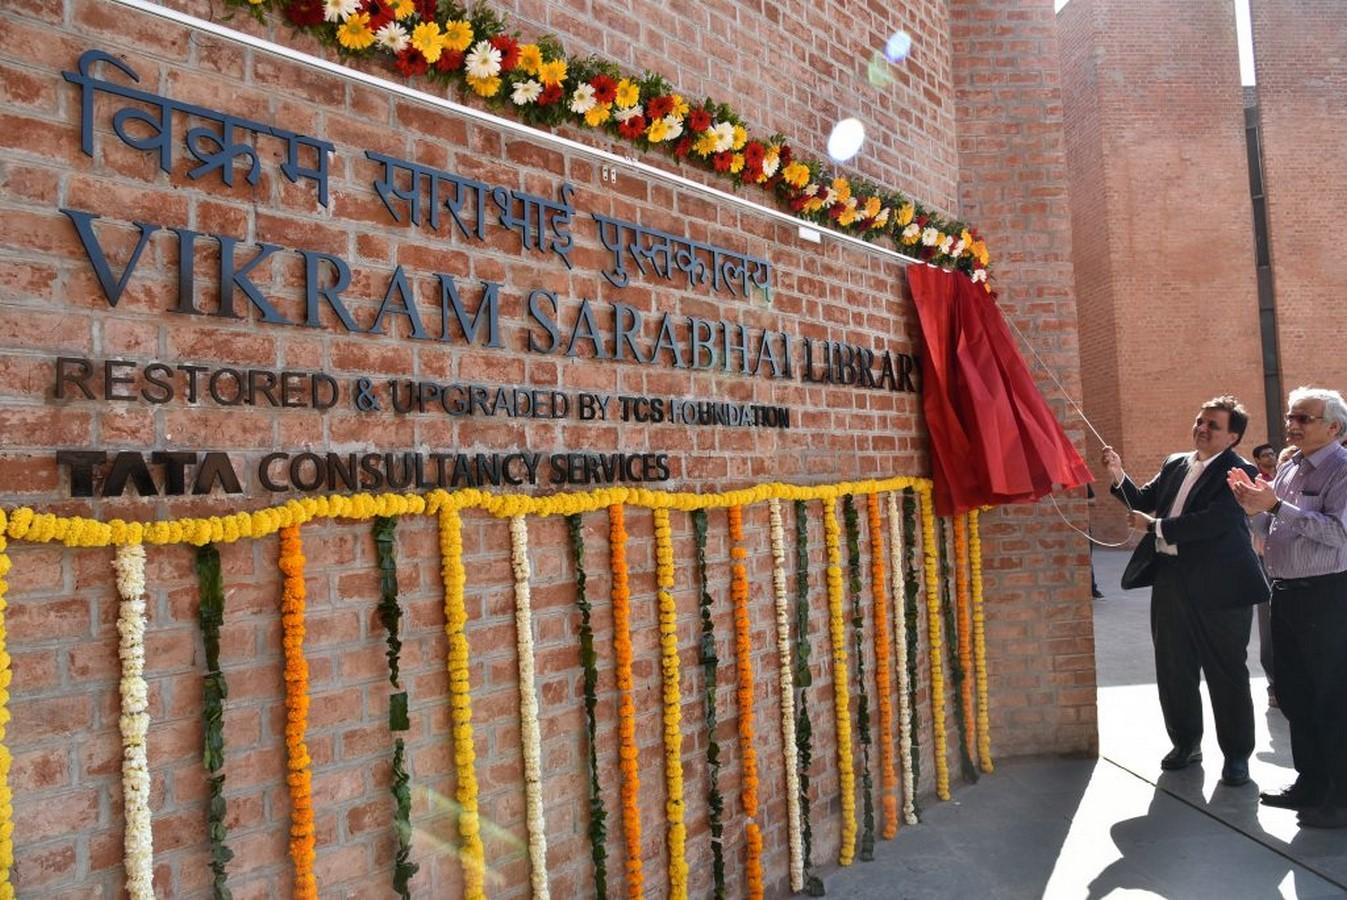 Restoration of Vikram Sarabhai Library at IIM Ahmedabad by Somaya and Kalappa Consultants Pvt. Ltd.: Finest Restoration - Sheet2